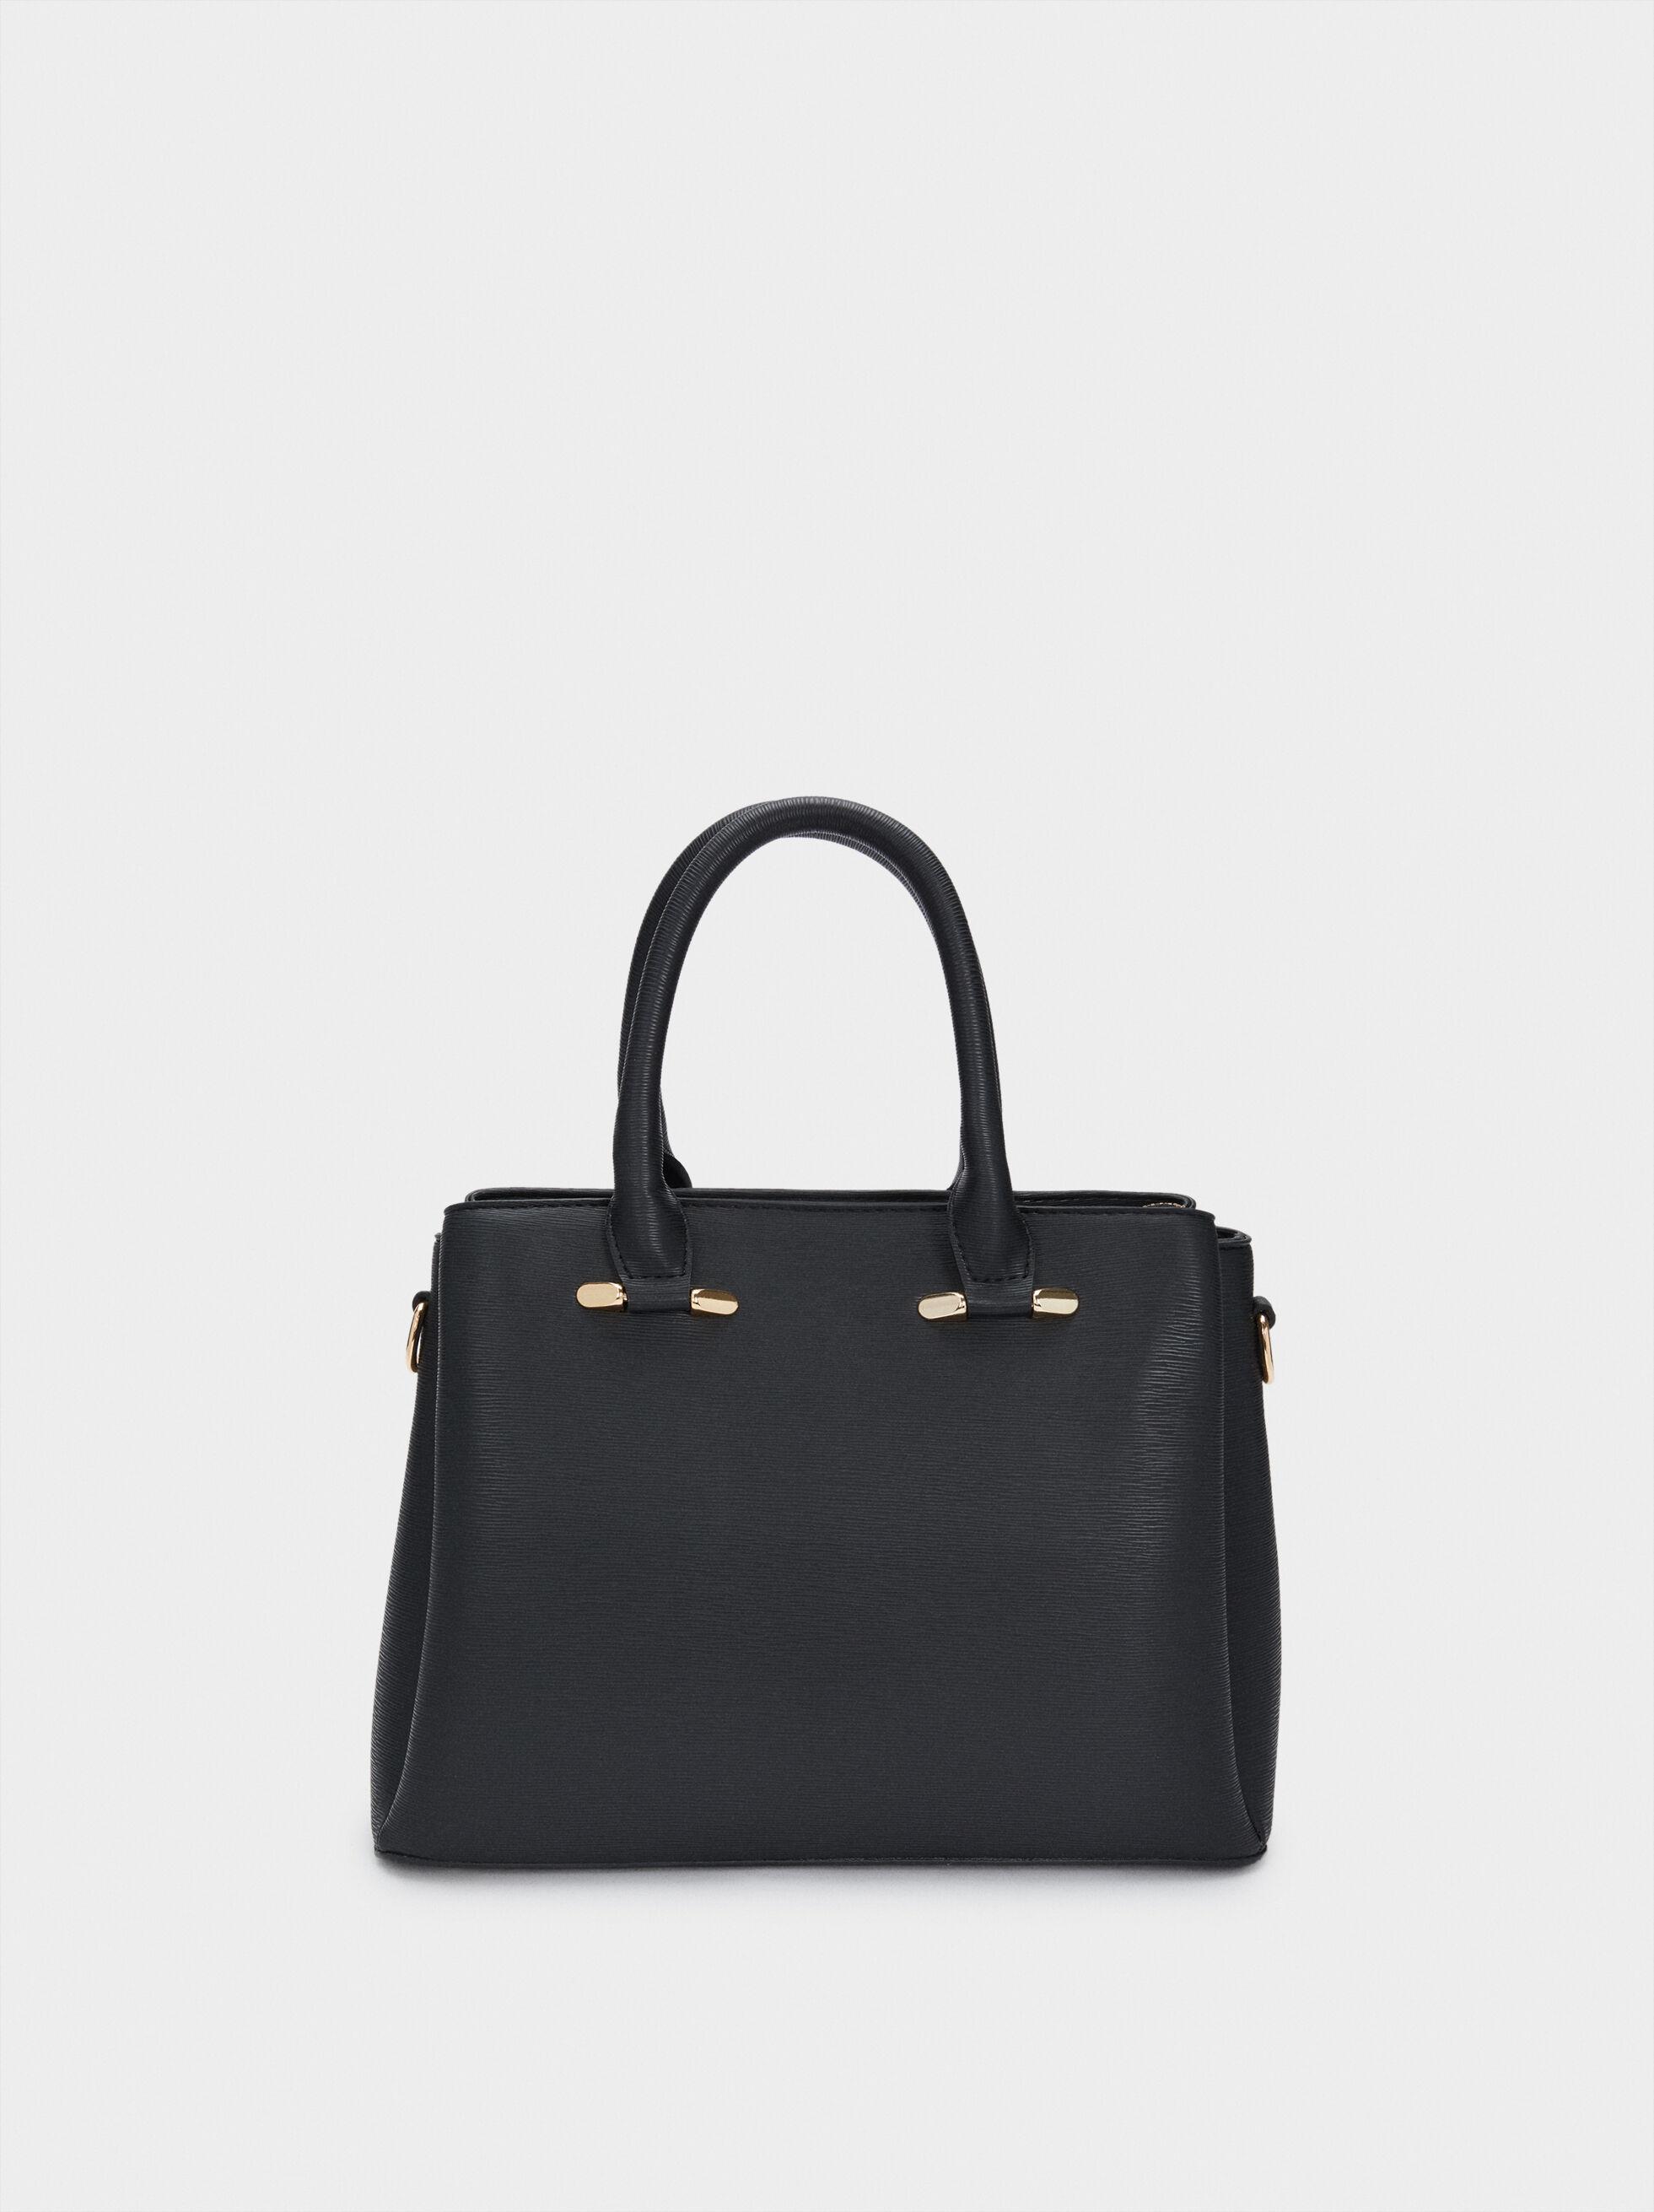 Tote Bag With Adjustable Handle, , hi-res